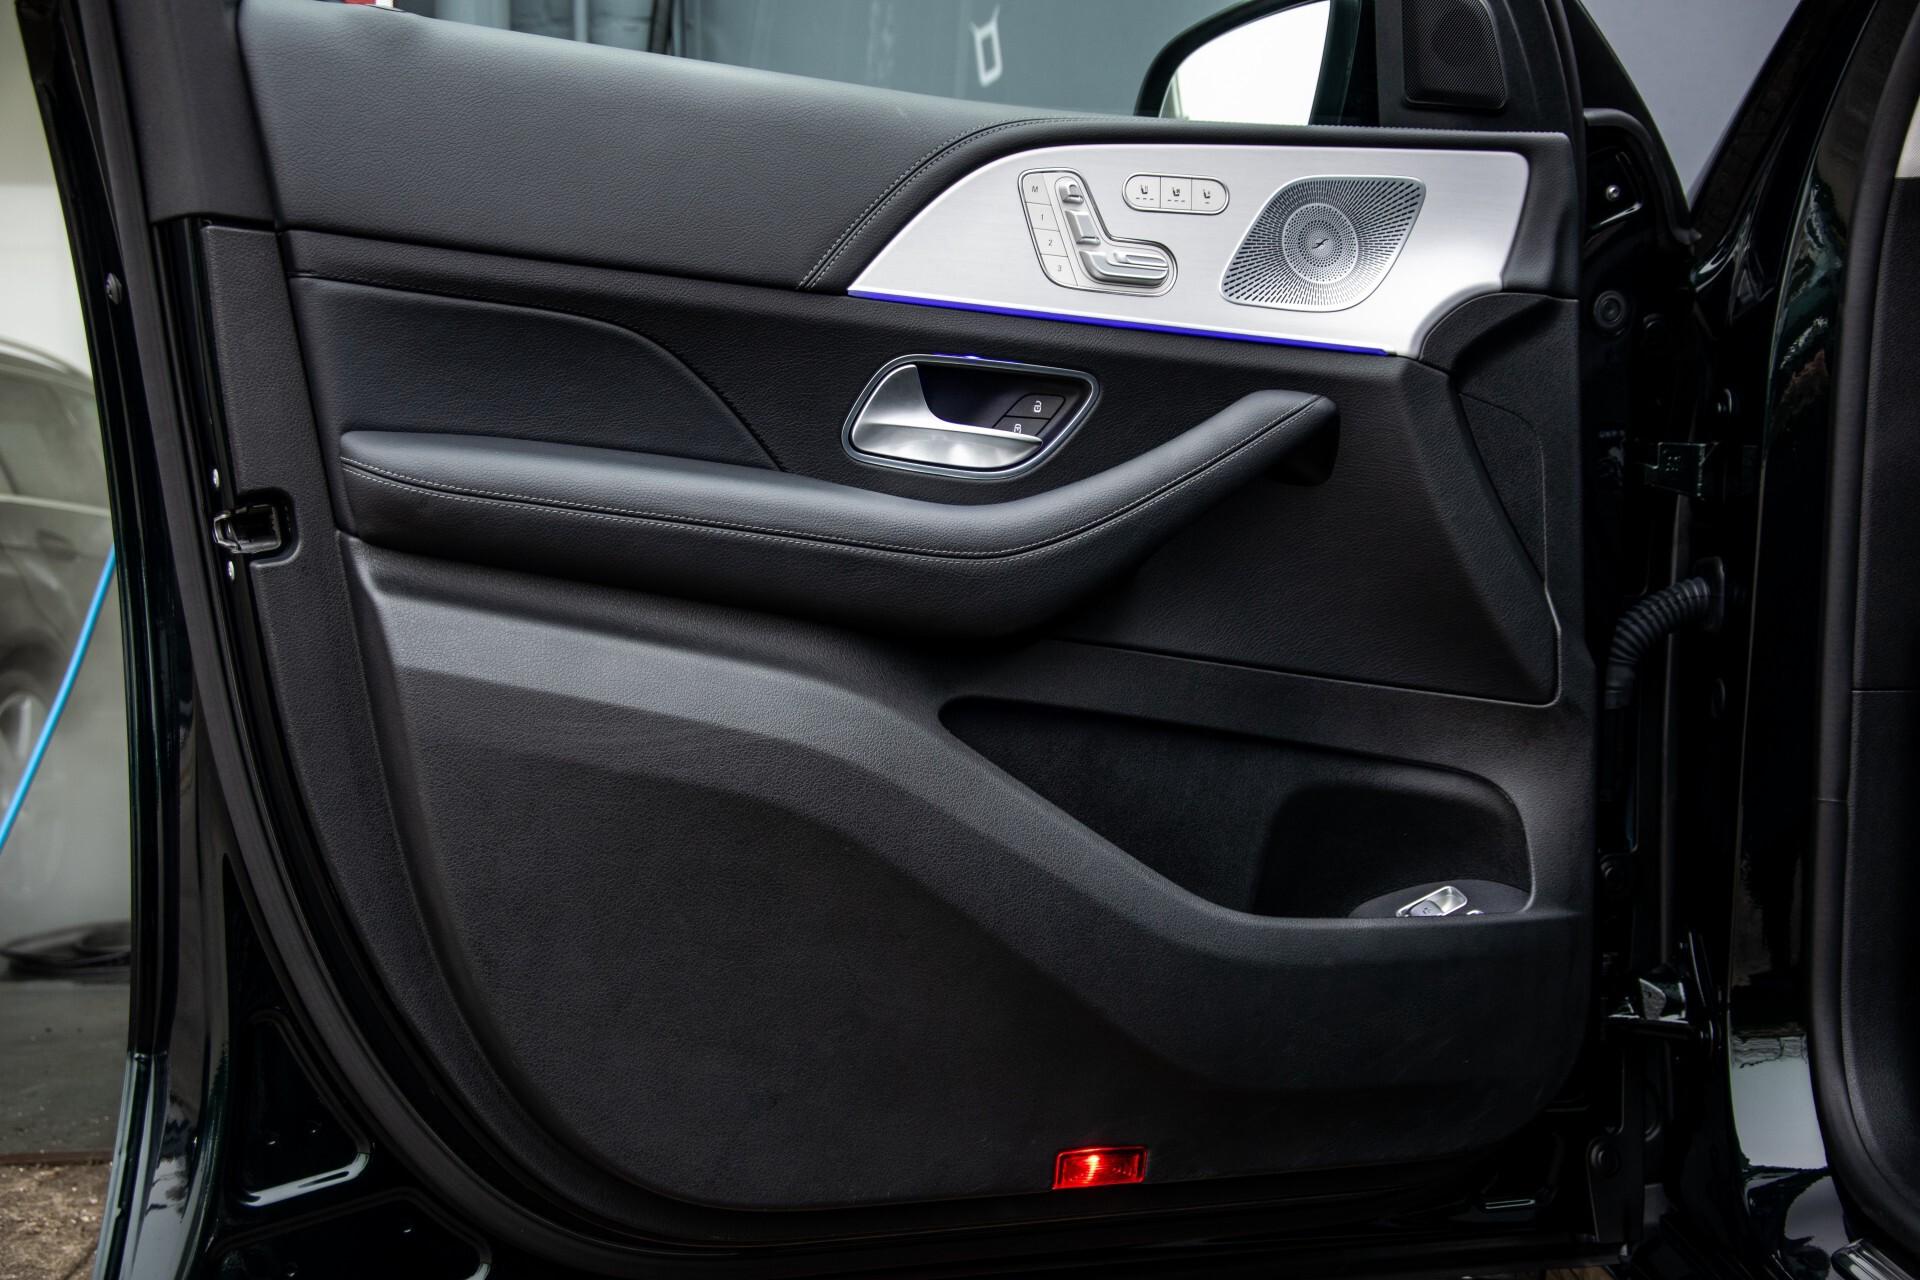 Mercedes-Benz GLE 450 4-M 7-Persoons AMG Massage/Rij-assist/Keyless/TV/360/Night/Trekhaak Aut9 Foto 51